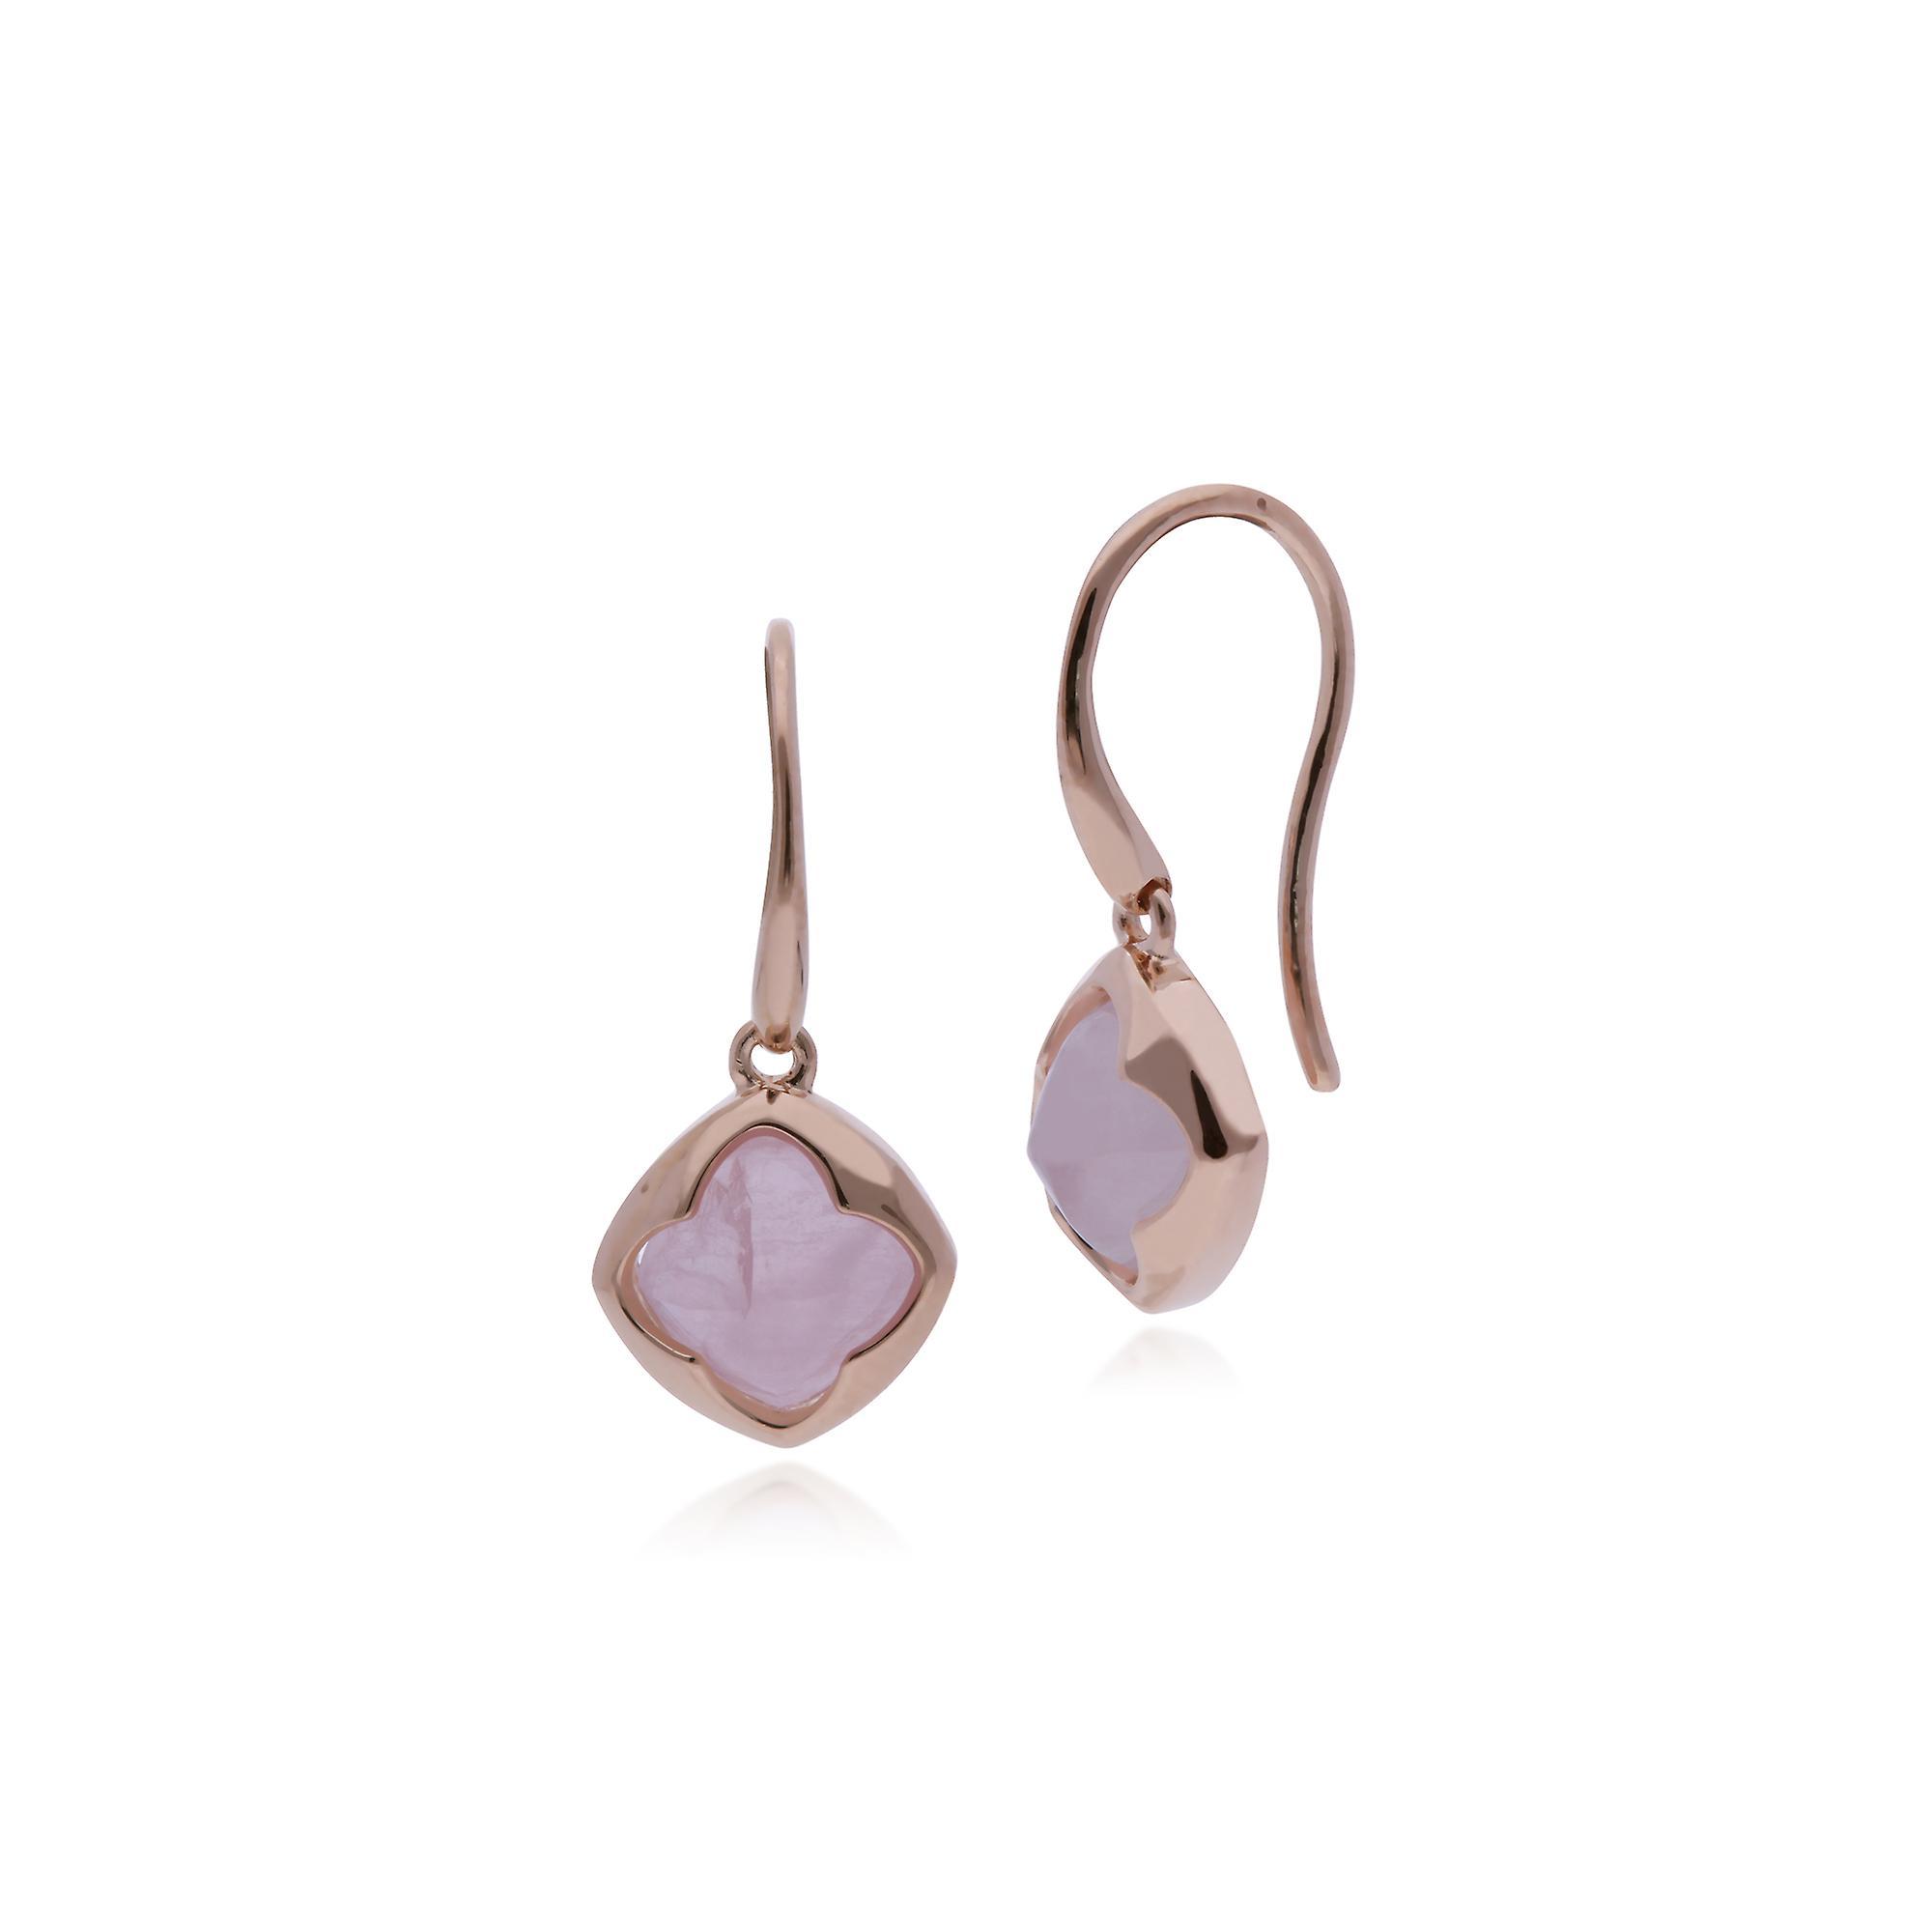 Gemondo Rose Plated Sterling Silver Cushion Sugarloaf Rose Quartz Drop Earrings